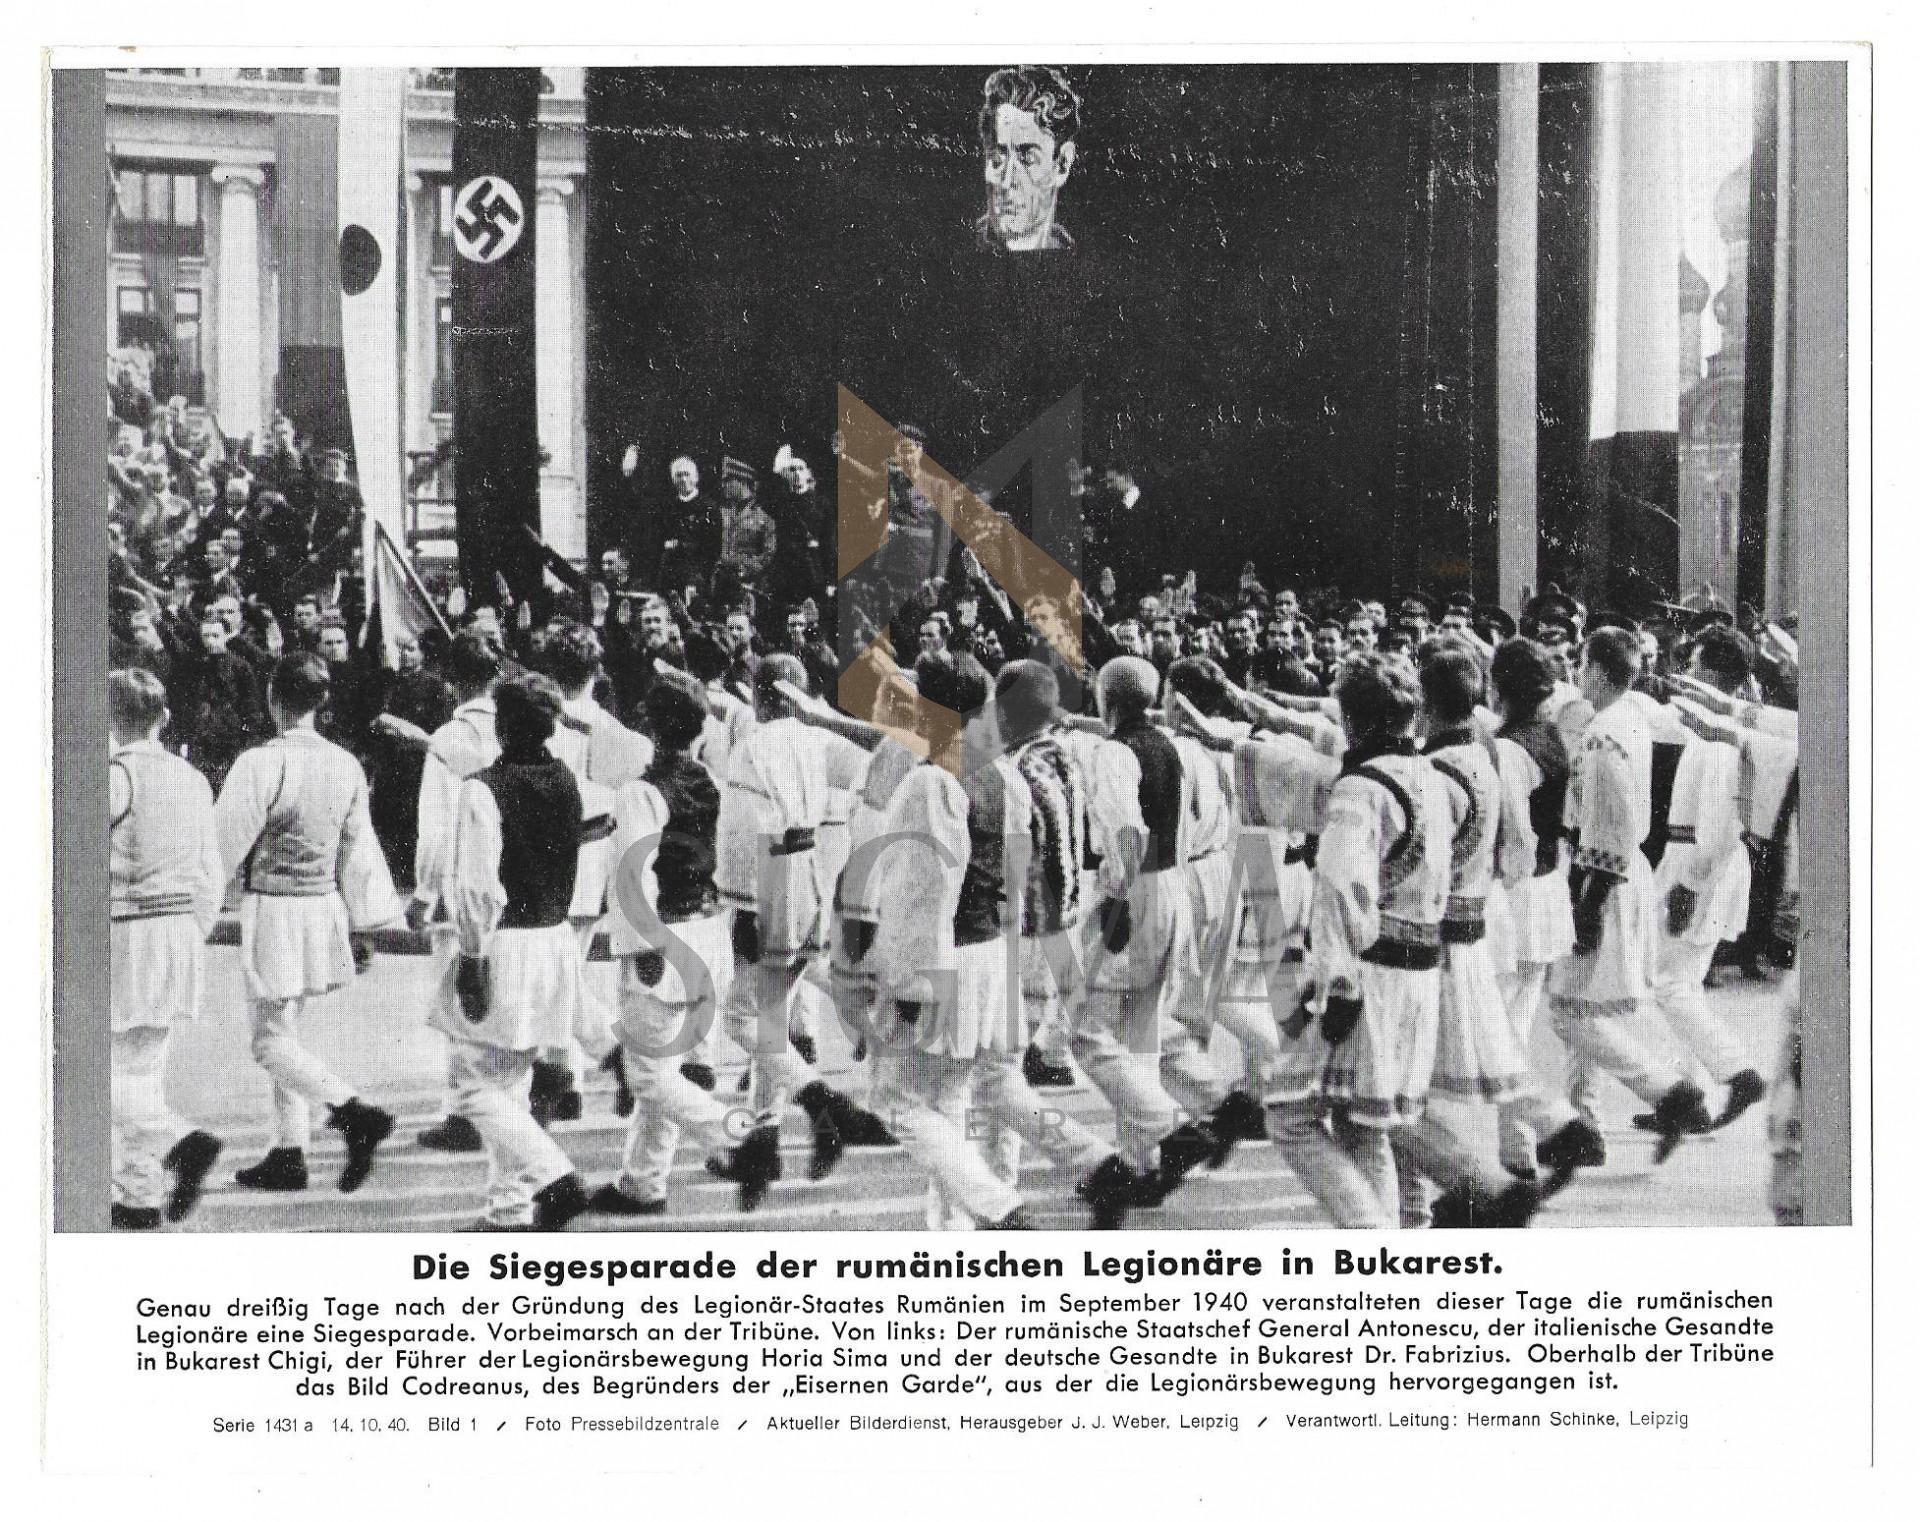 FOTOGRAFIE DE PRESA, MANIFESTATIA MISCARII LEGIONARE , HORIA SIMA, MARESALUL ION ANTONESCU, 1940